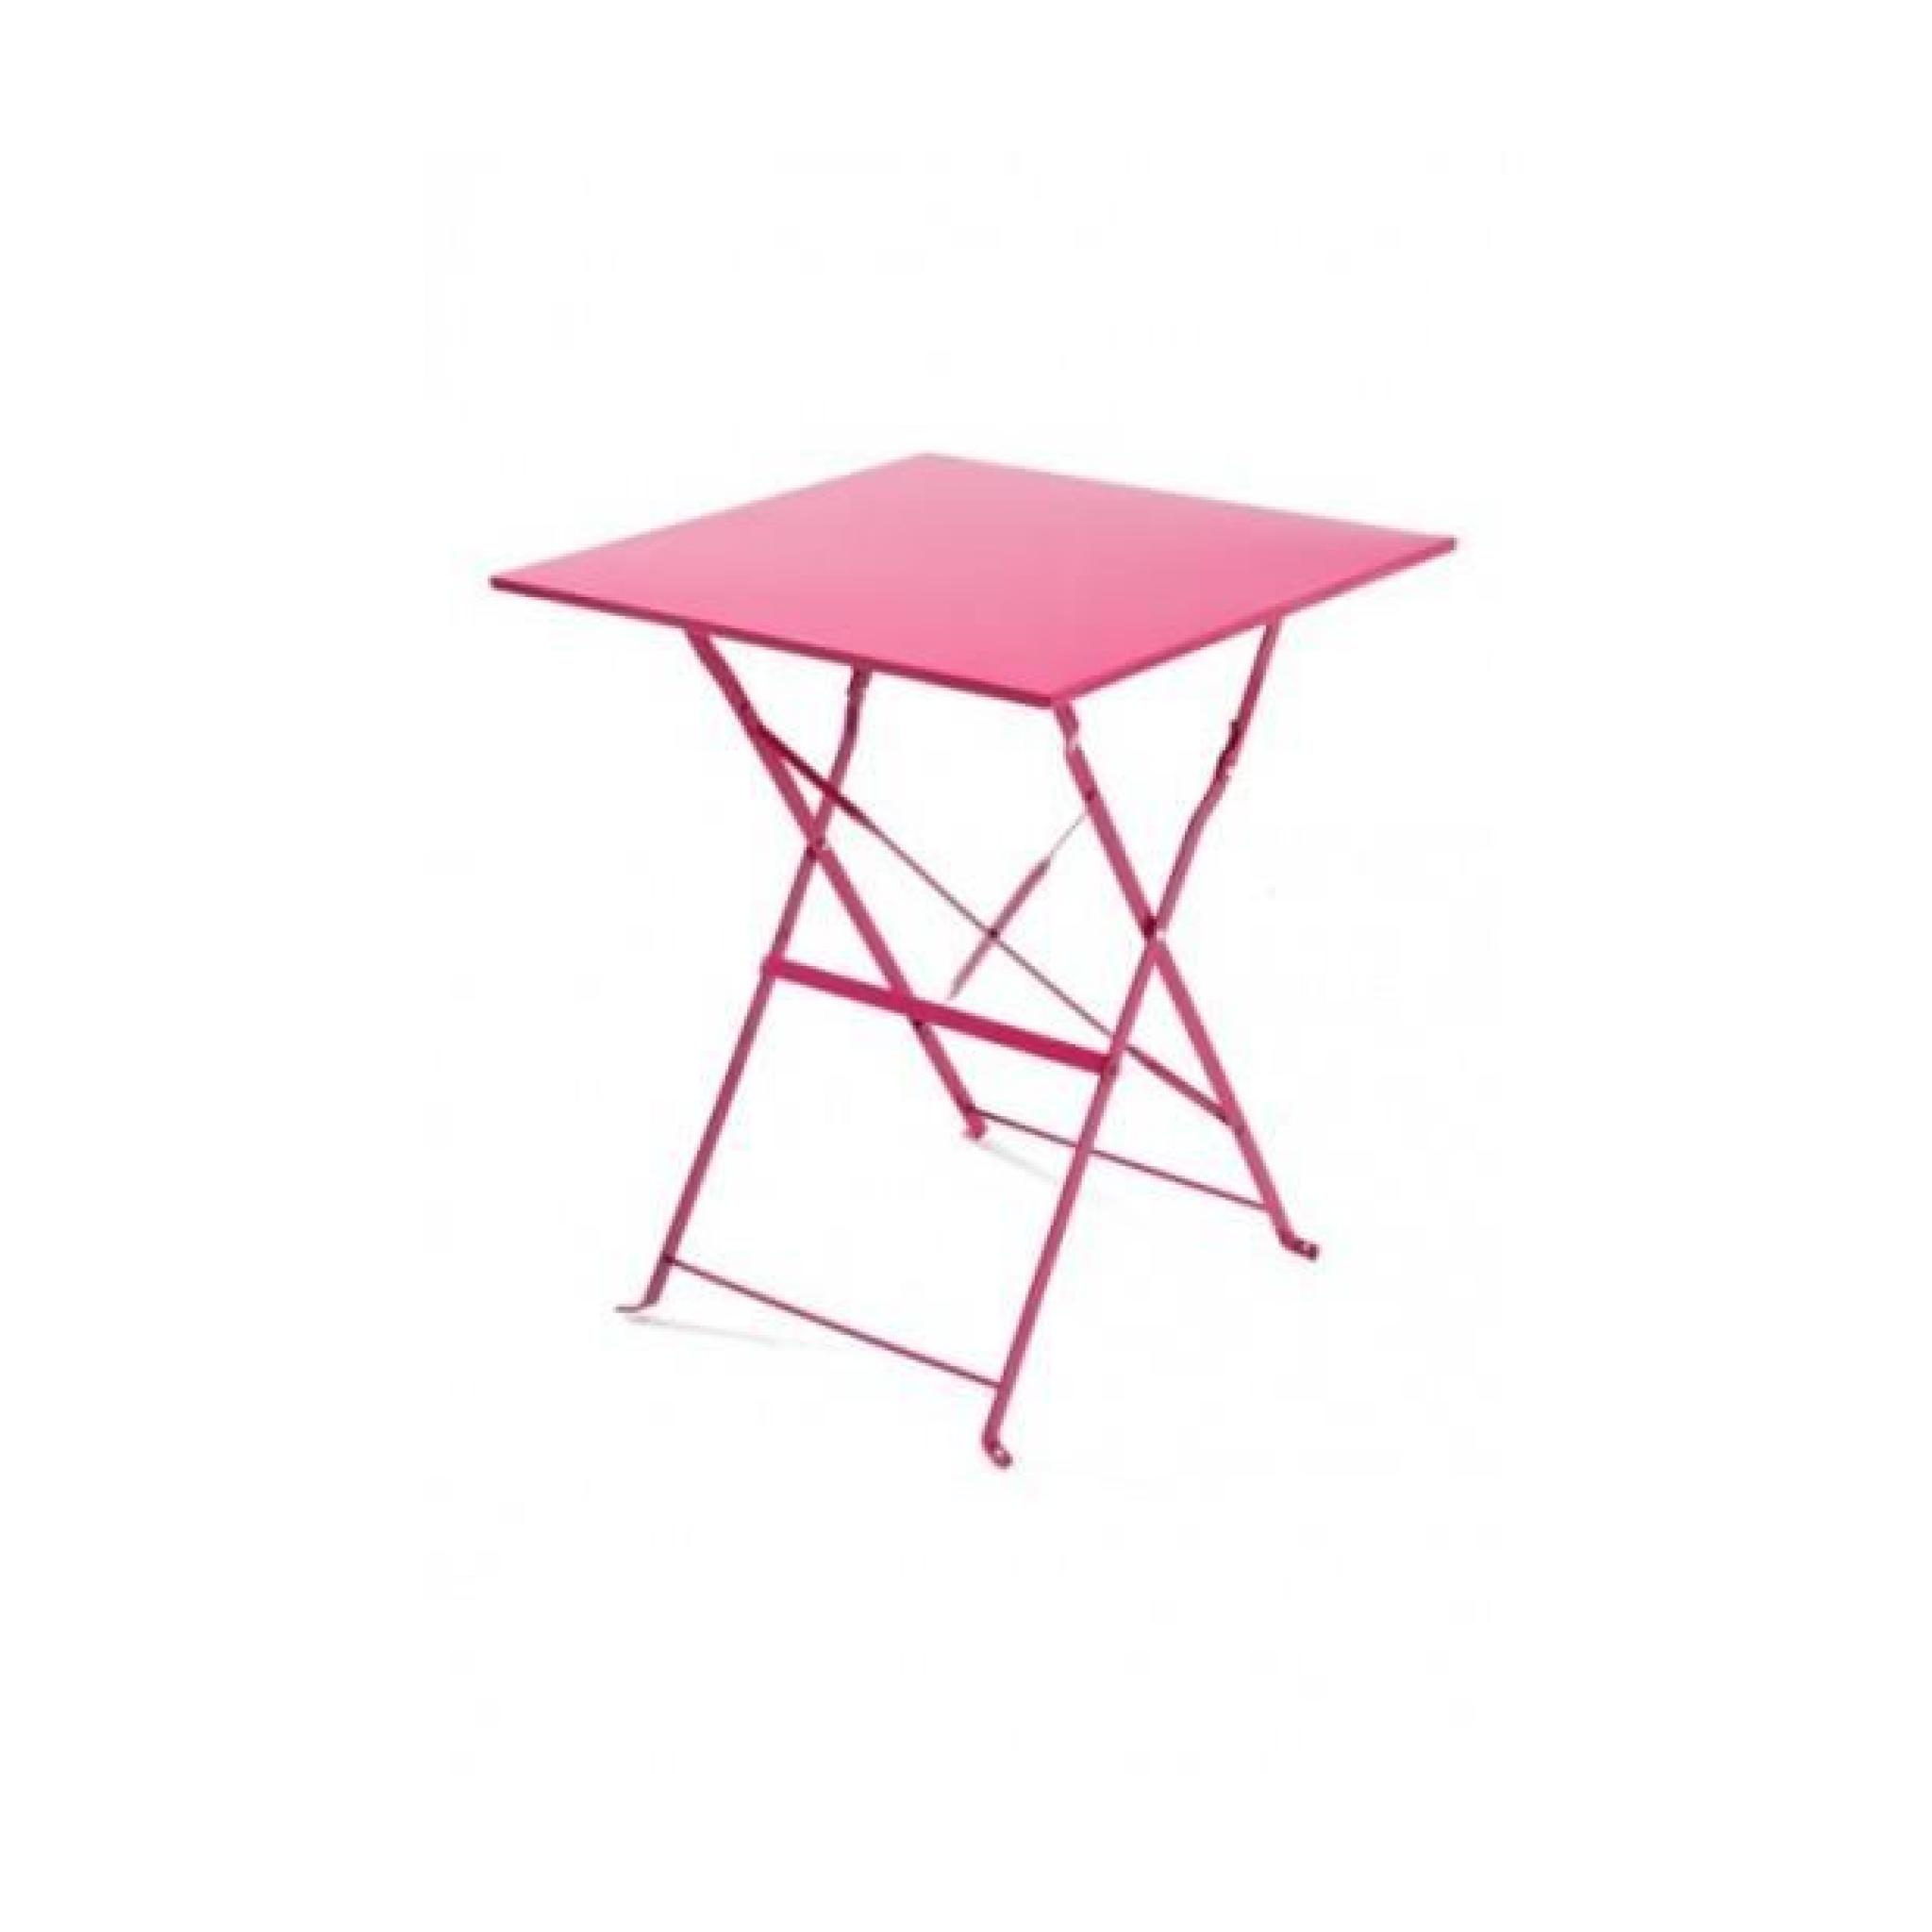 magnifique table bistrot carr e rose framboise achat vente table salle a manger pas cher. Black Bedroom Furniture Sets. Home Design Ideas